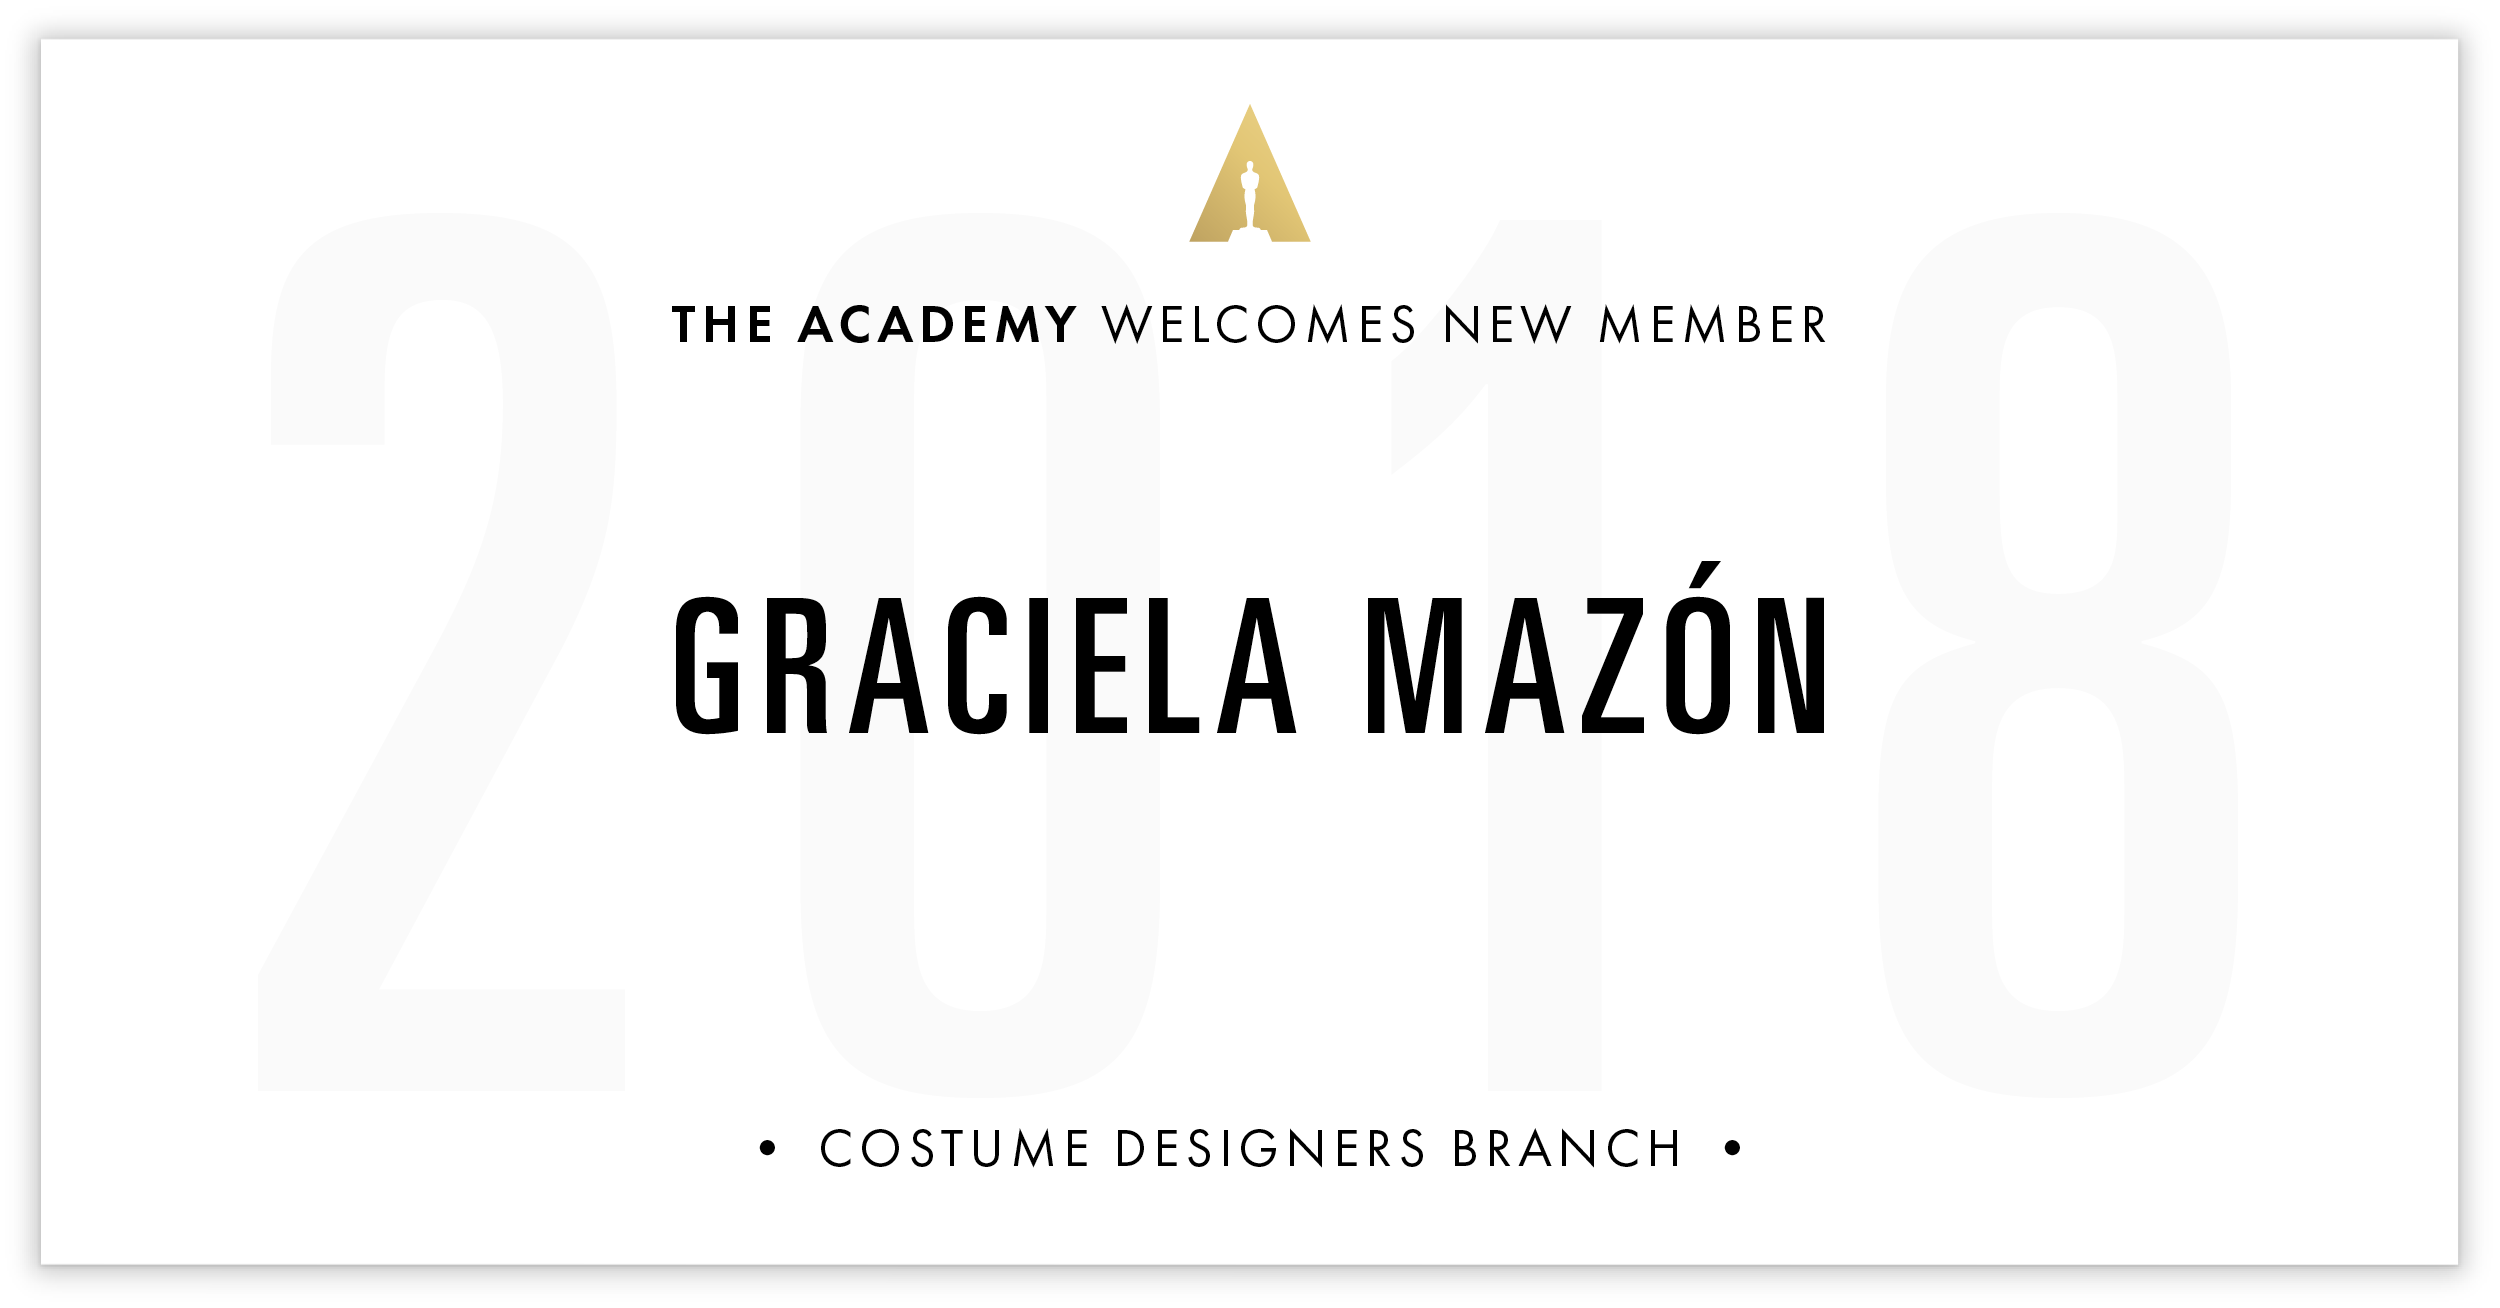 Graciela Mazón is invited!